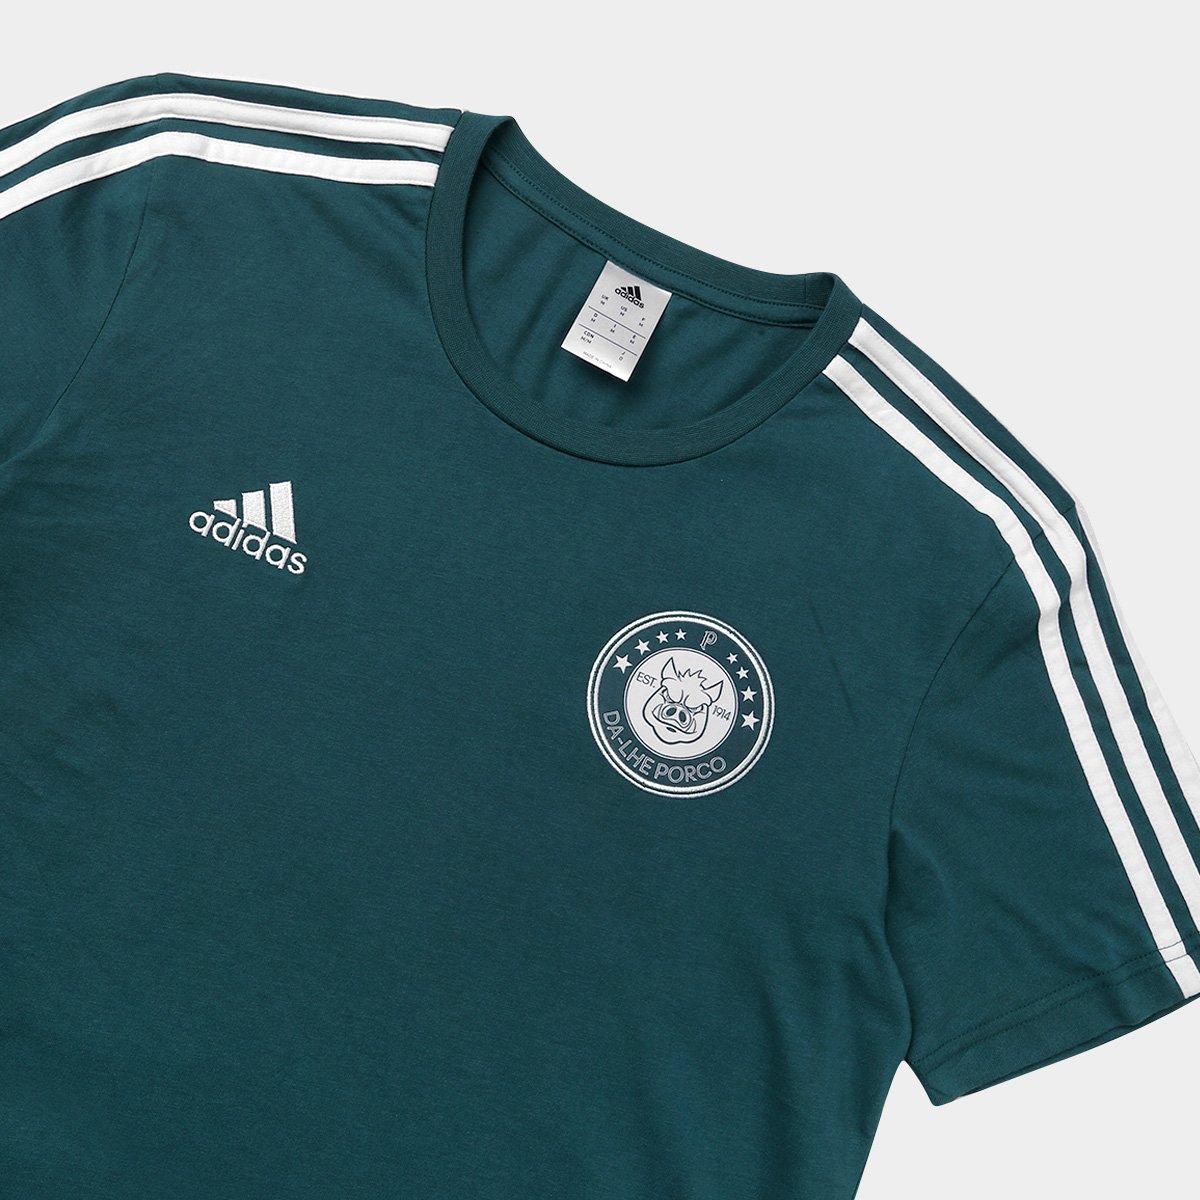 Camiseta Palmeiras Adidas 3S Masculina - Compre Agora  e6e43f85d9dd4